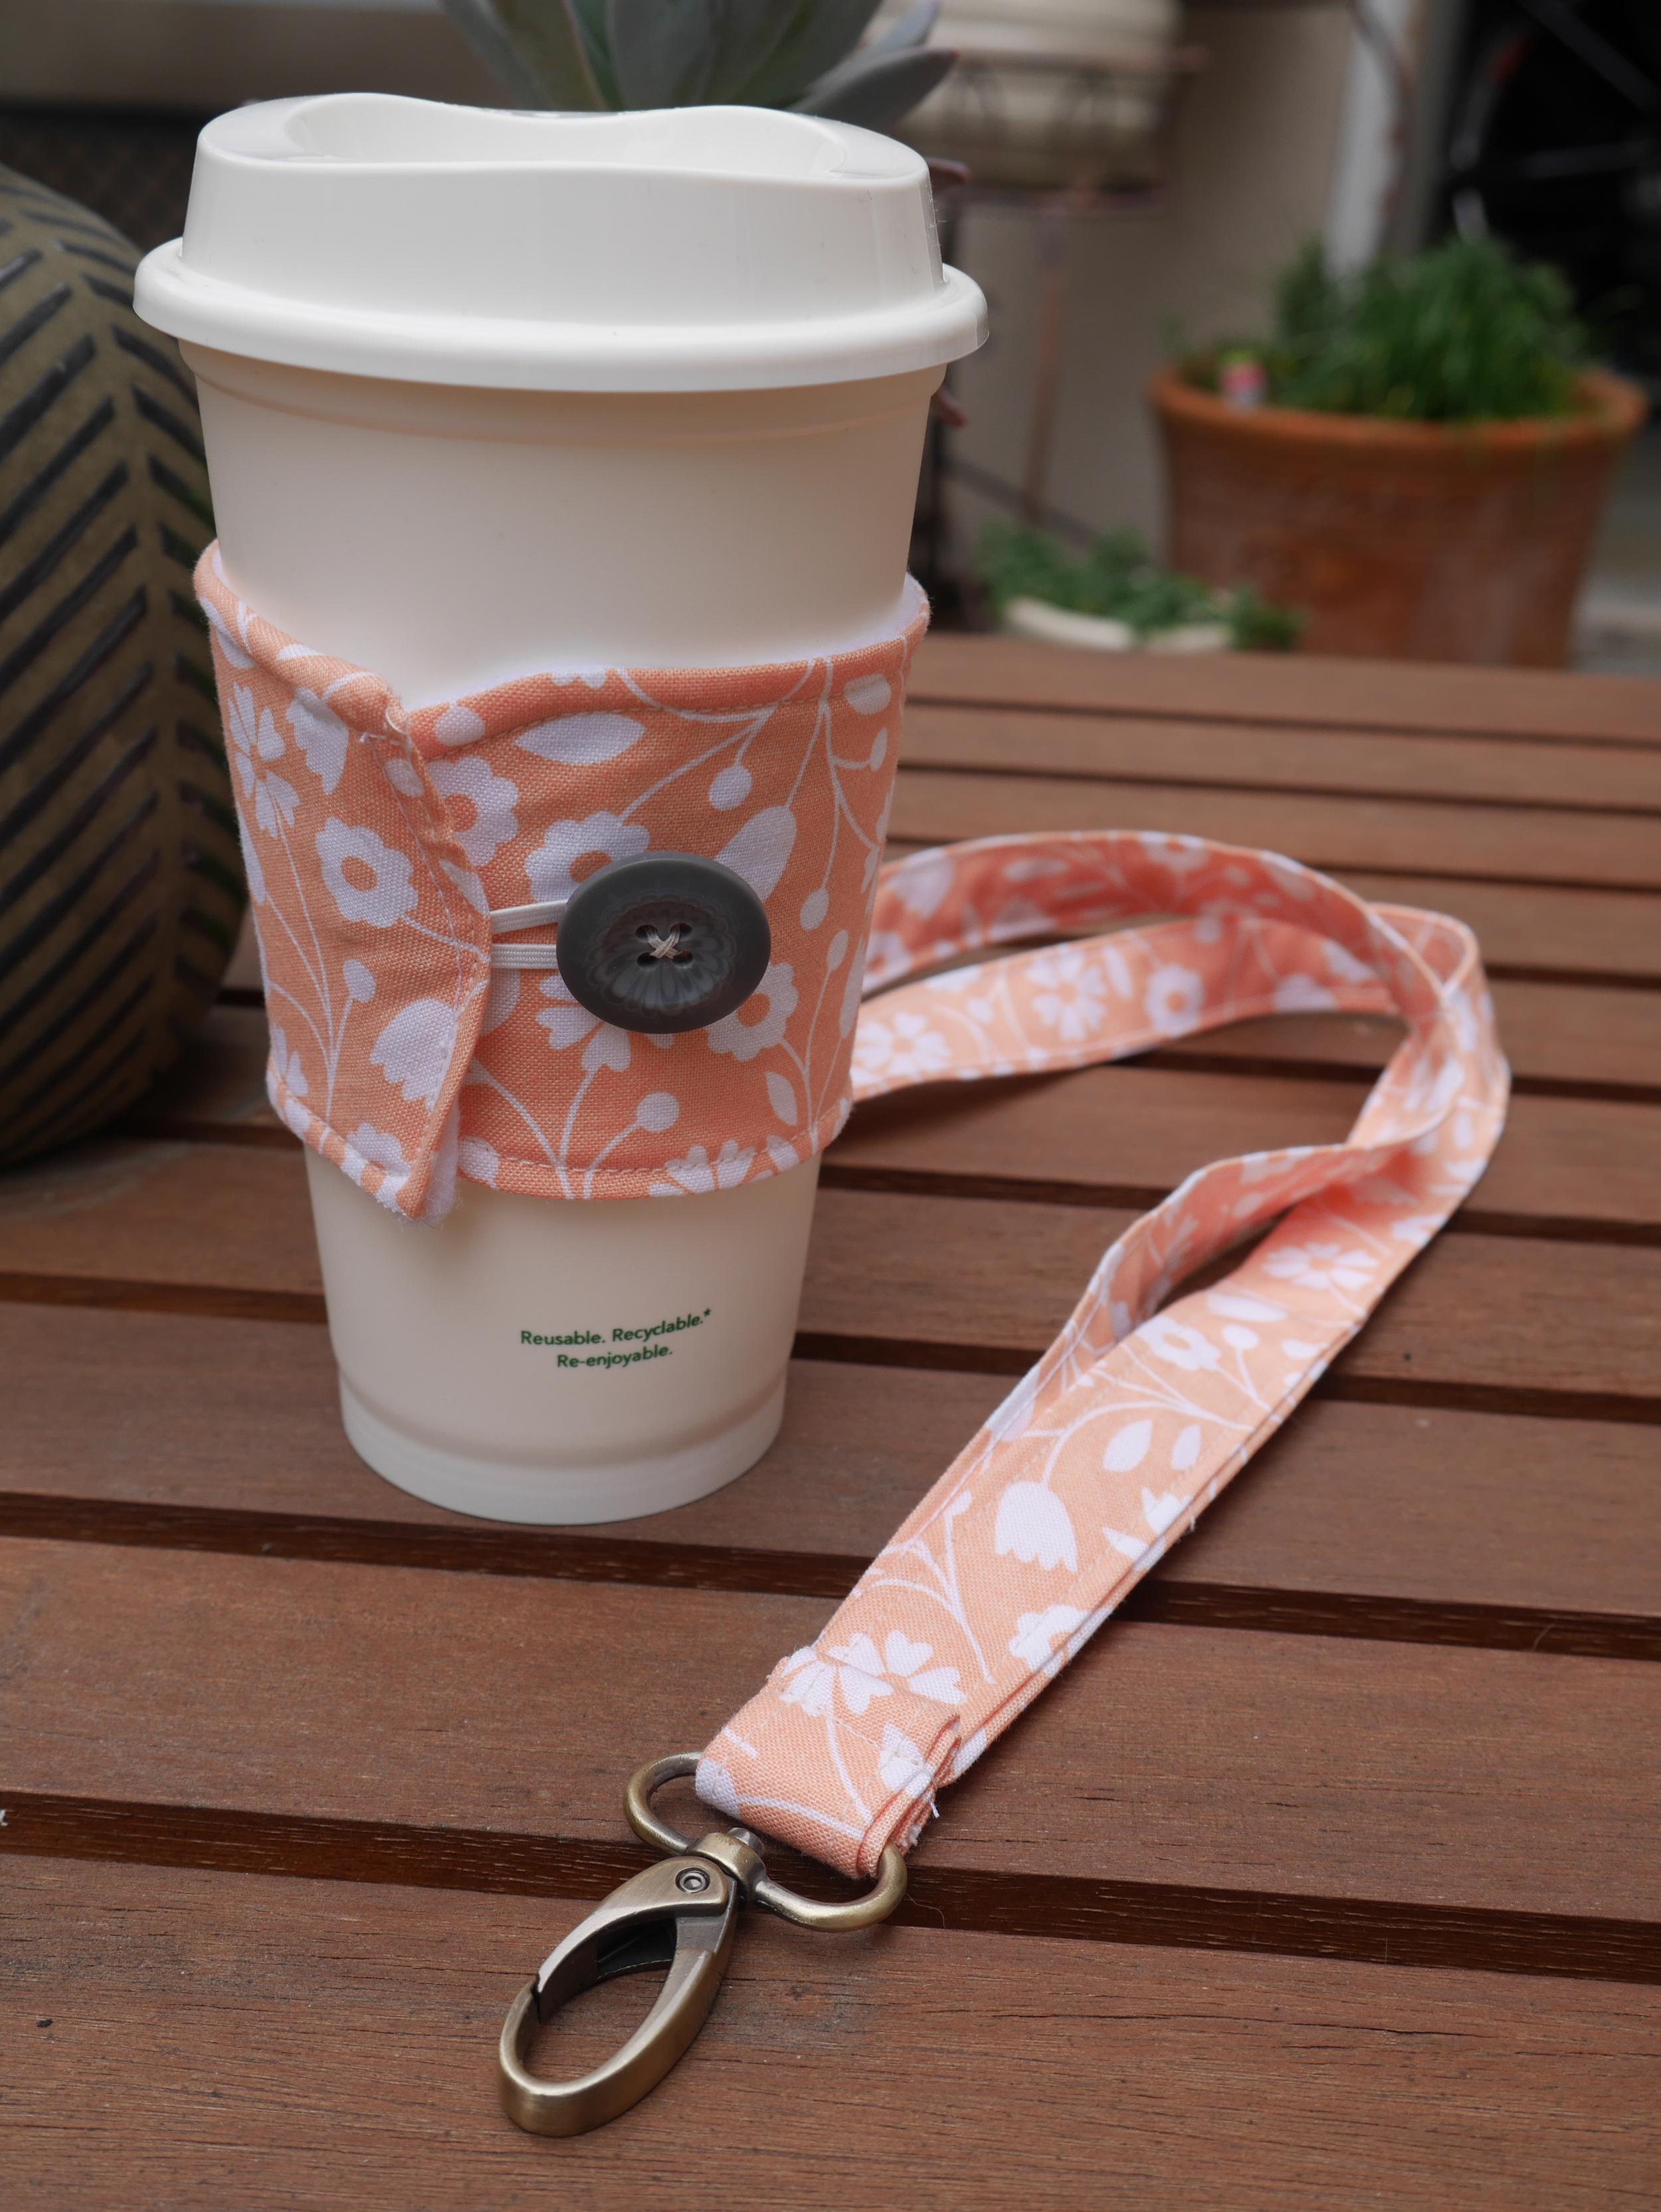 Lanyard and Coffee Koozie, a gift for a teacher friend